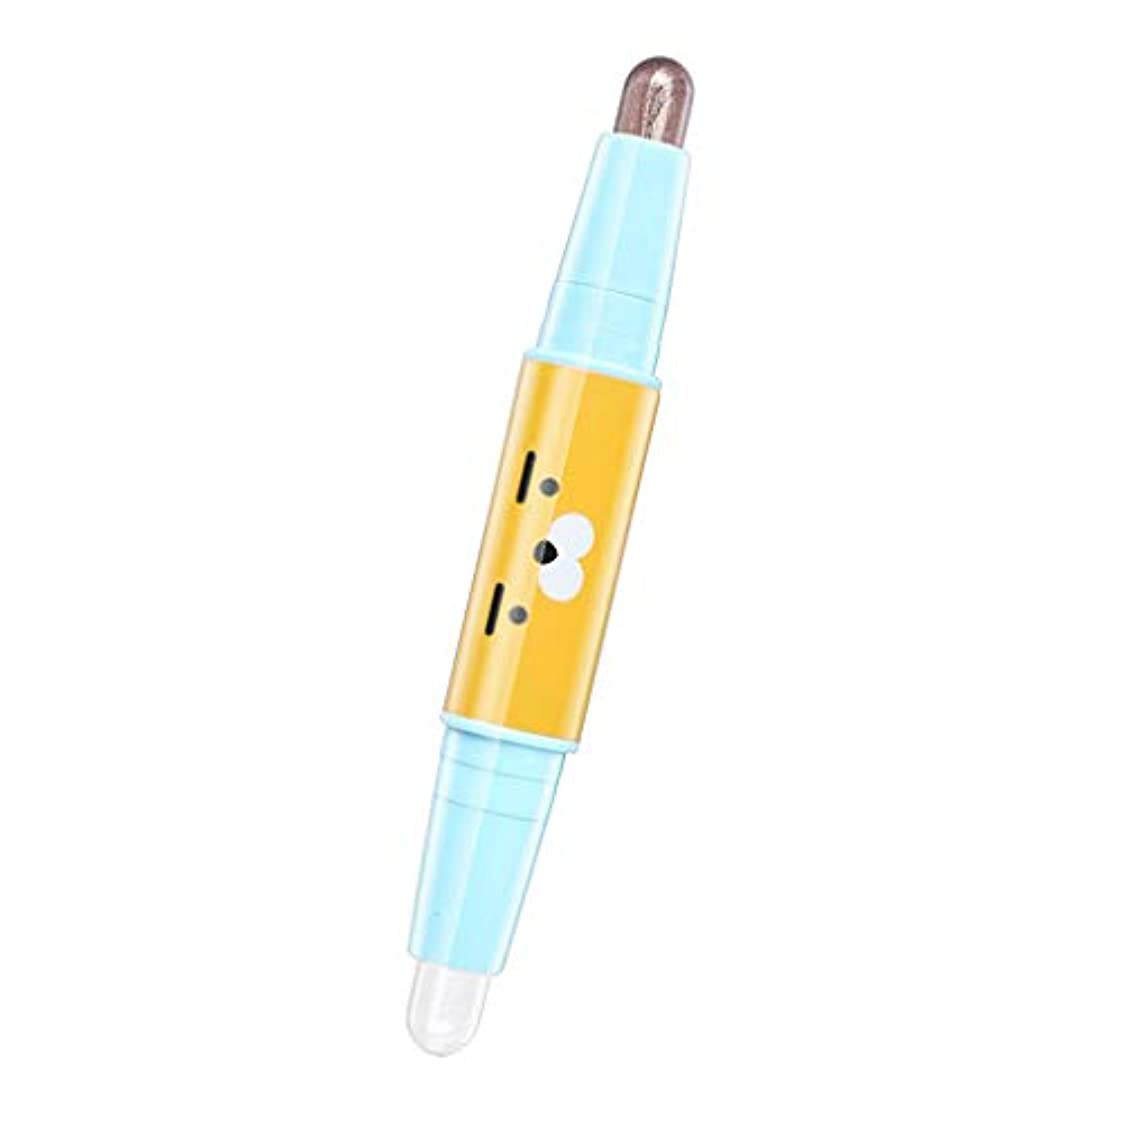 DYNWAVE 女性 アイシャドー アイシャドウ アイシャドウスティック アイシャドウペン キラキラ 防水 全6色 - 05